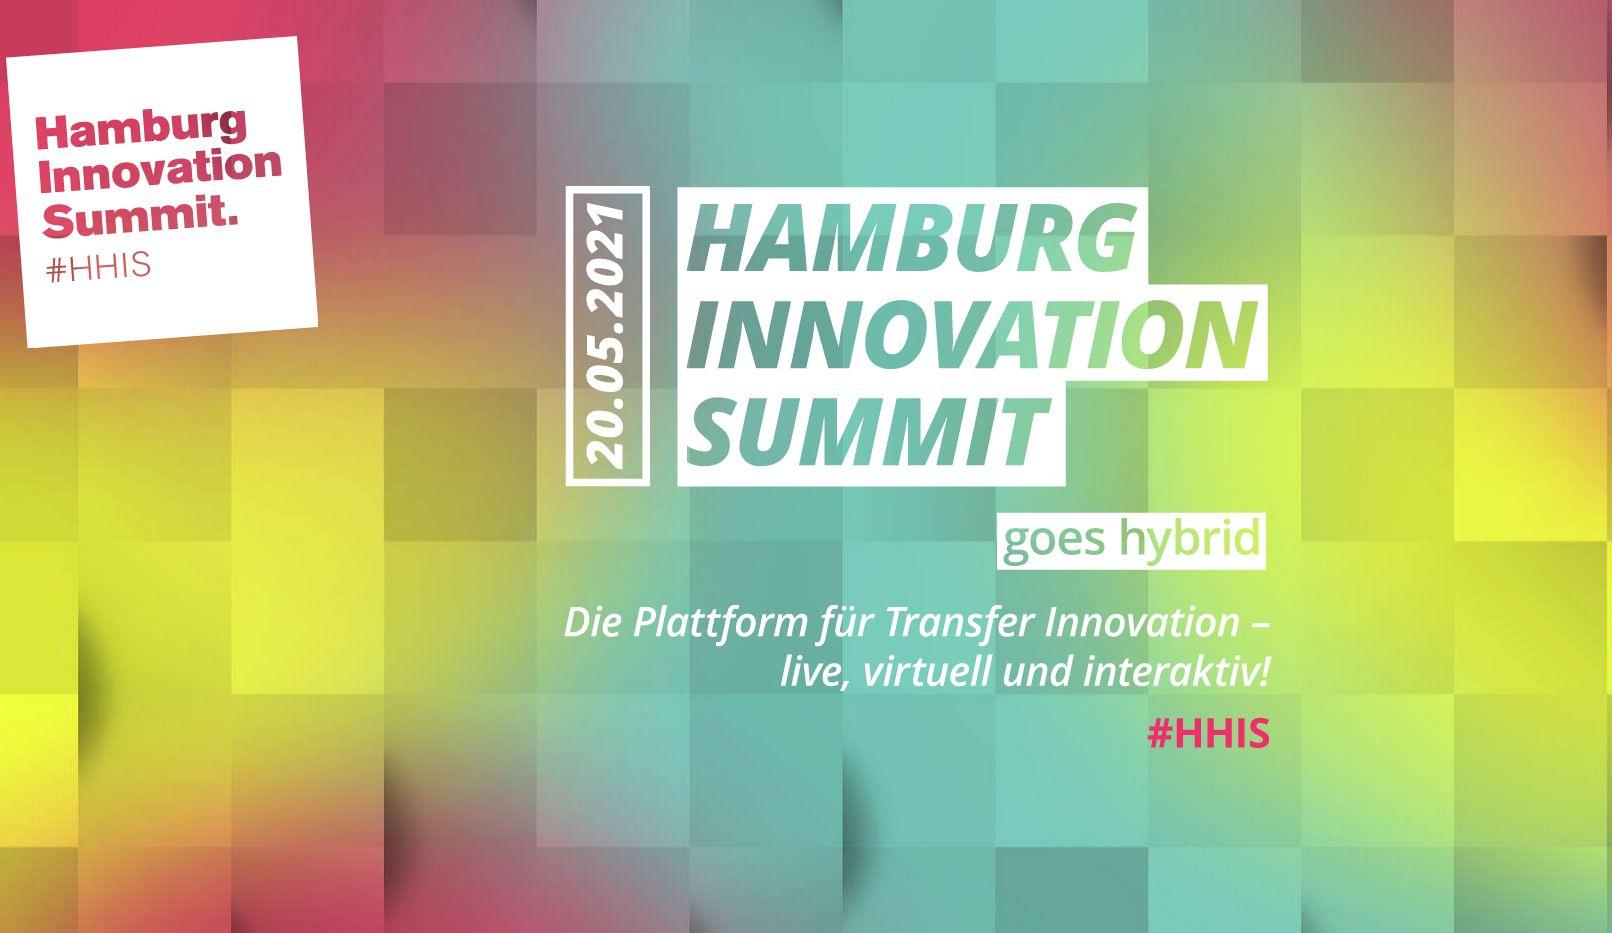 Hamburg Innovation Summit